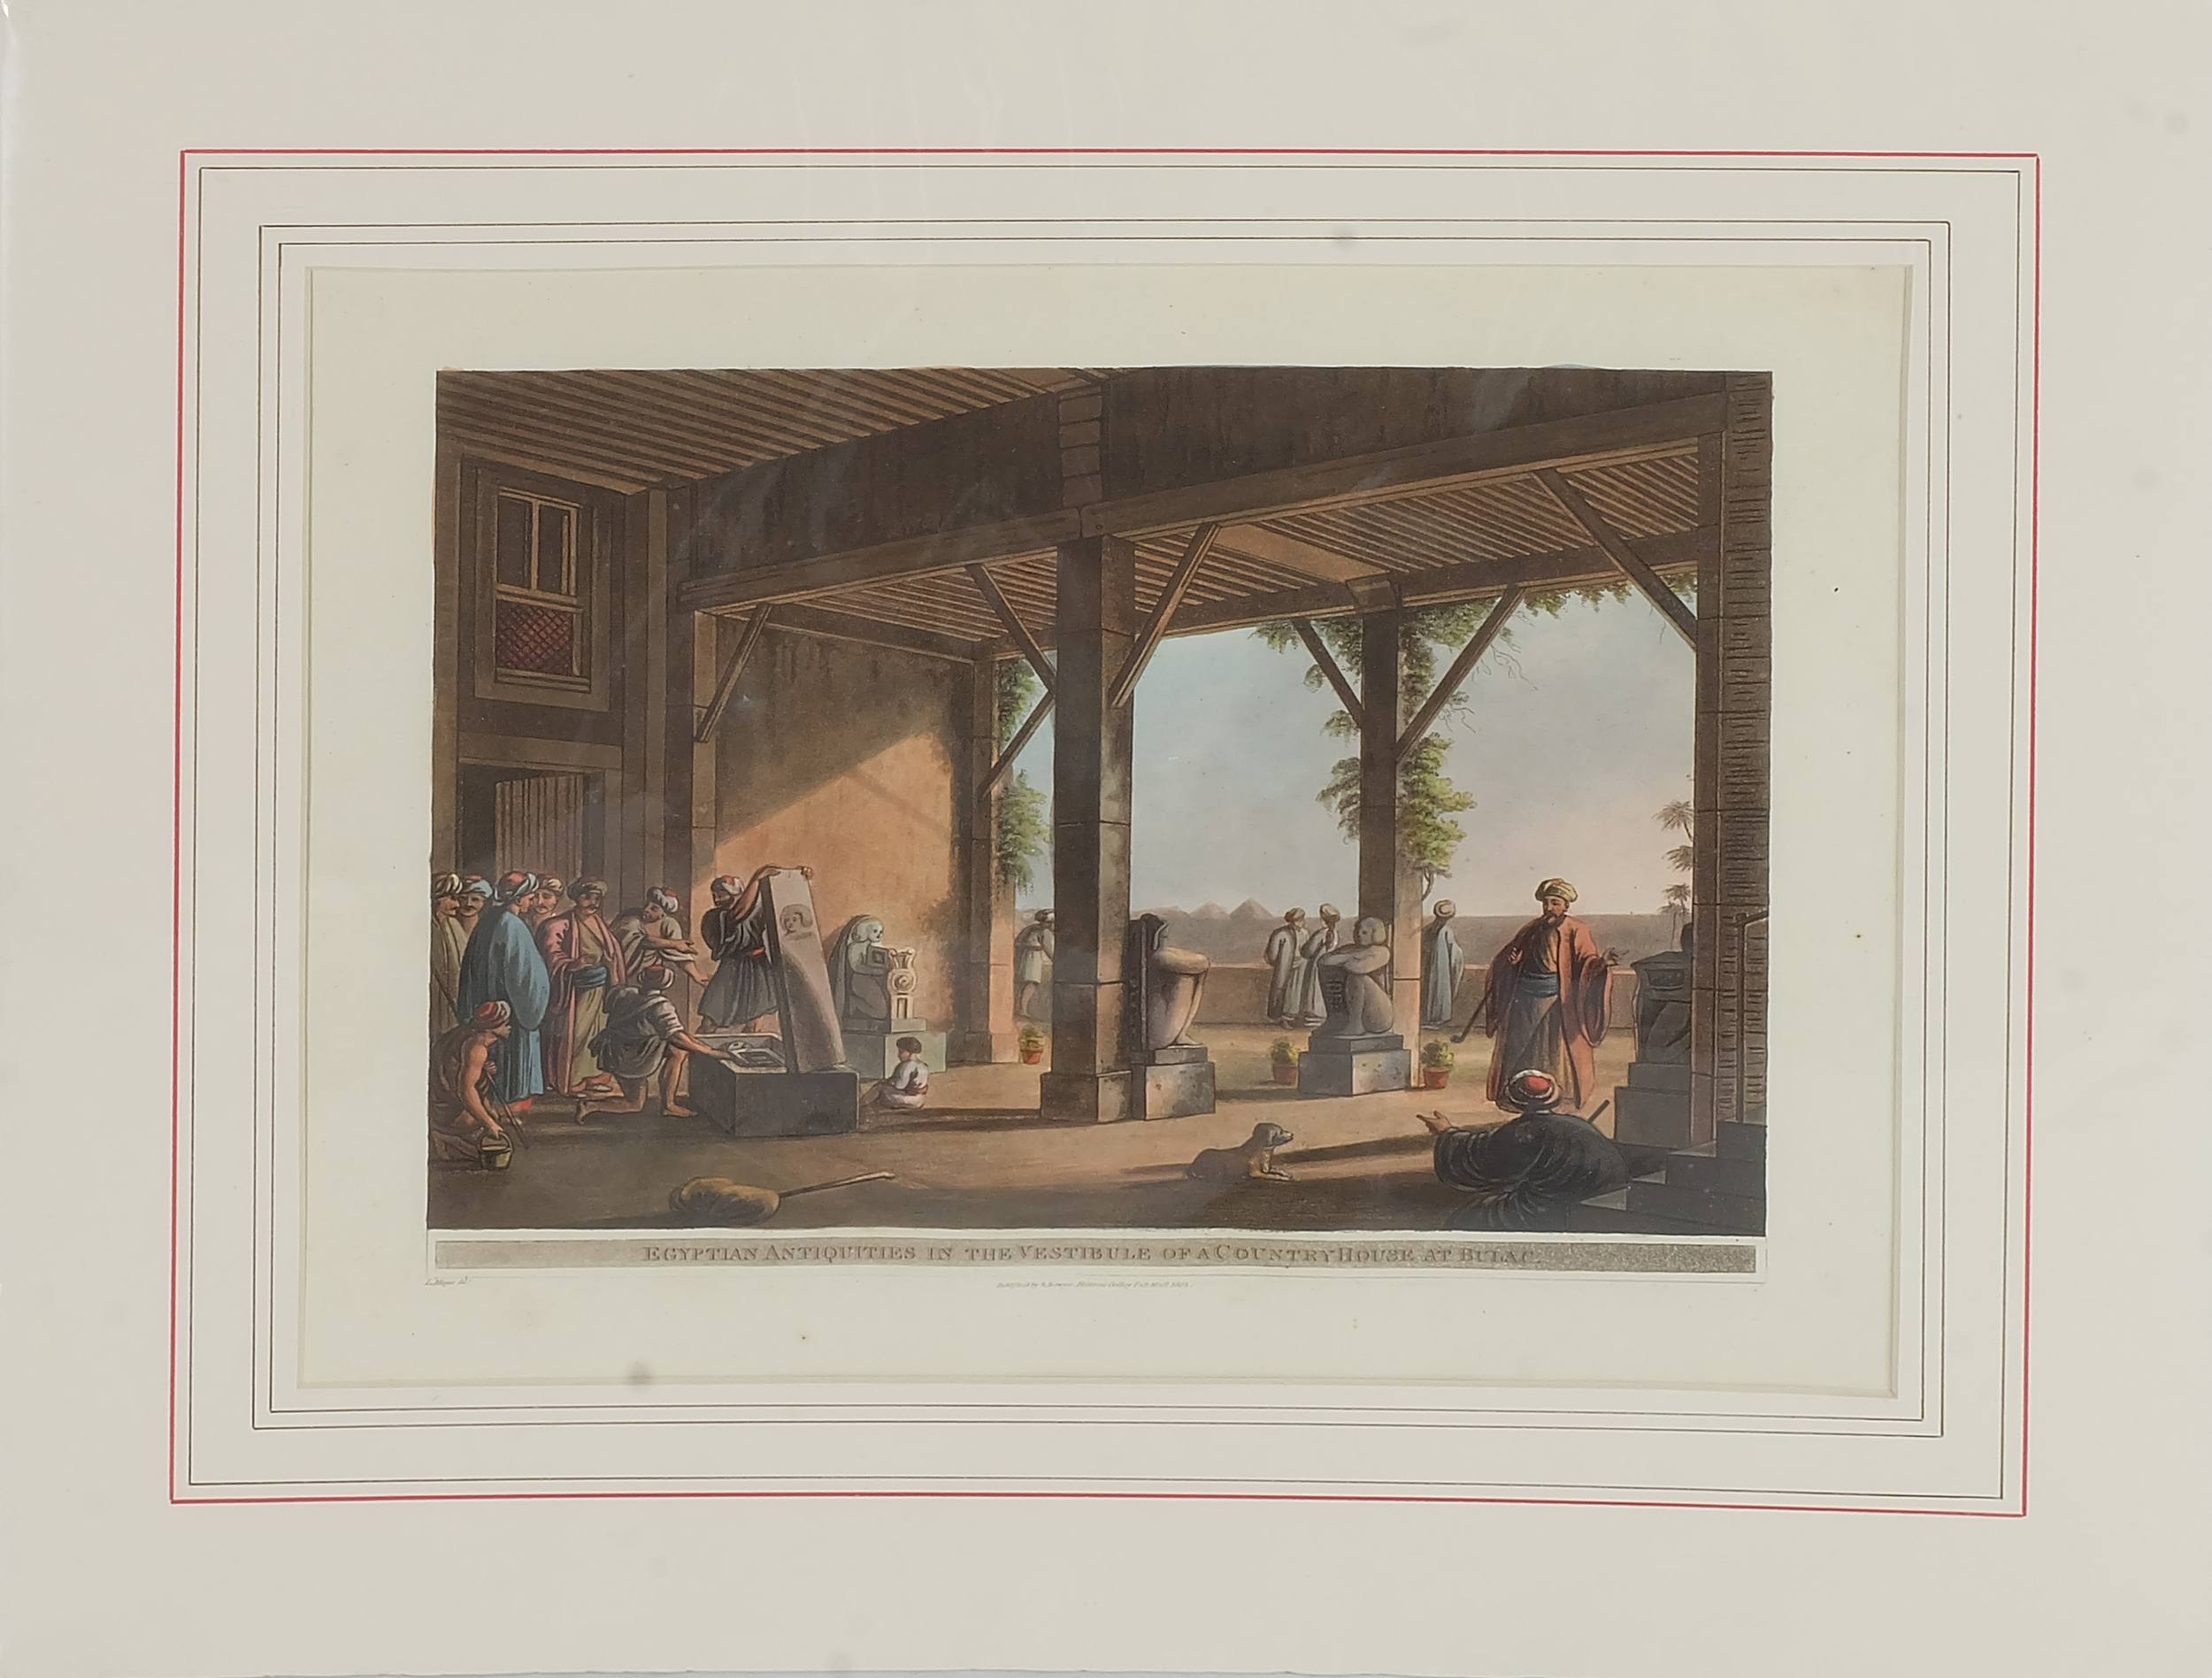 'Luigi Mayer (Italian 1755-1803) Egyptian Antiquities in the Vestibule of a Countryhouse at Bulam, Colour Engraving, Circa 1802'